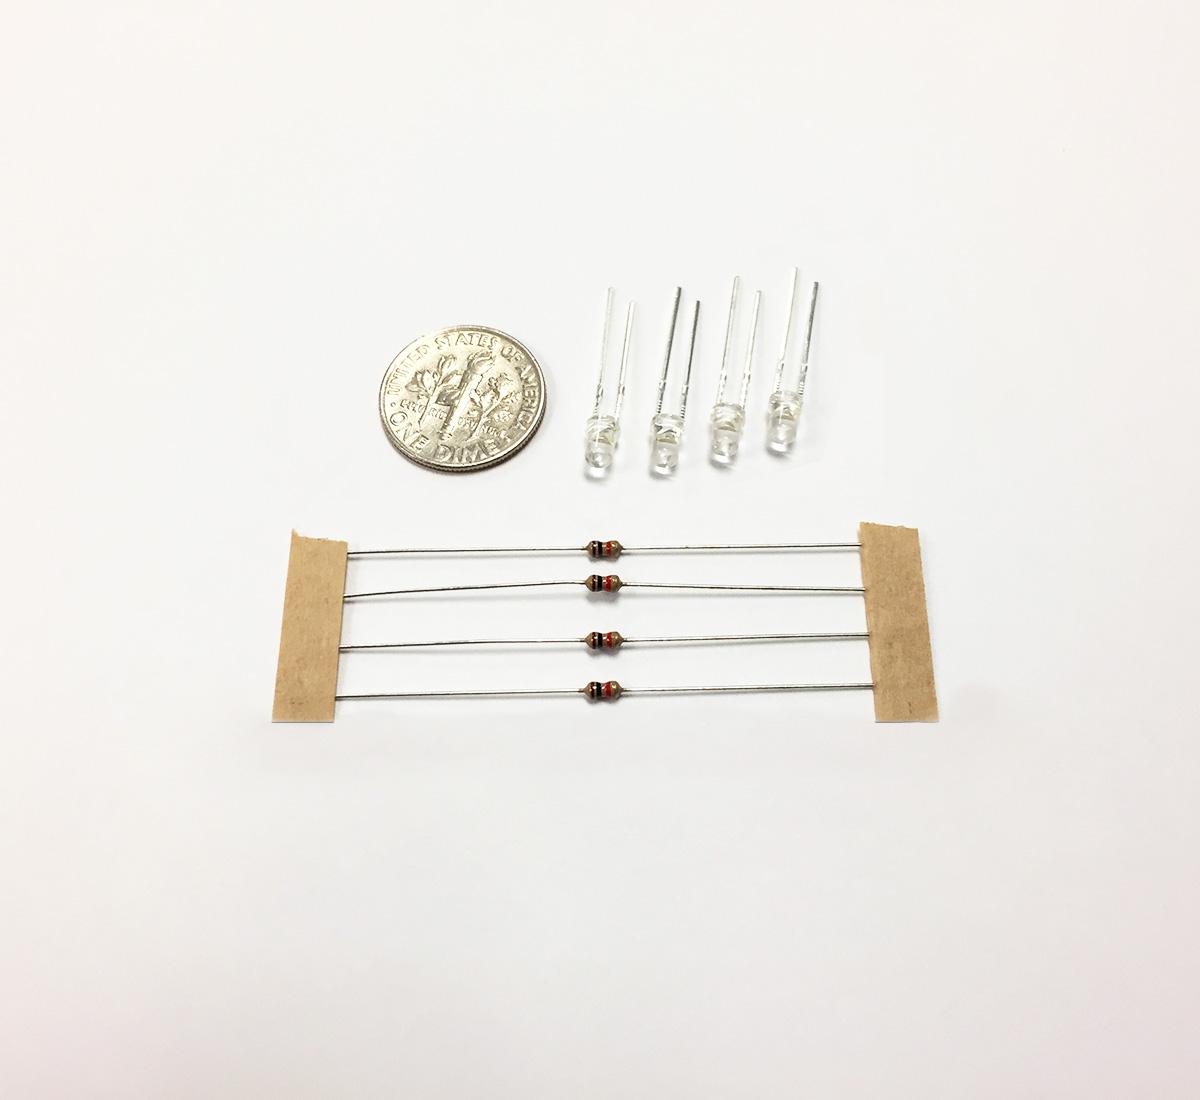 led3m4-warm-white-3mm-led-4-pack-w-resistors